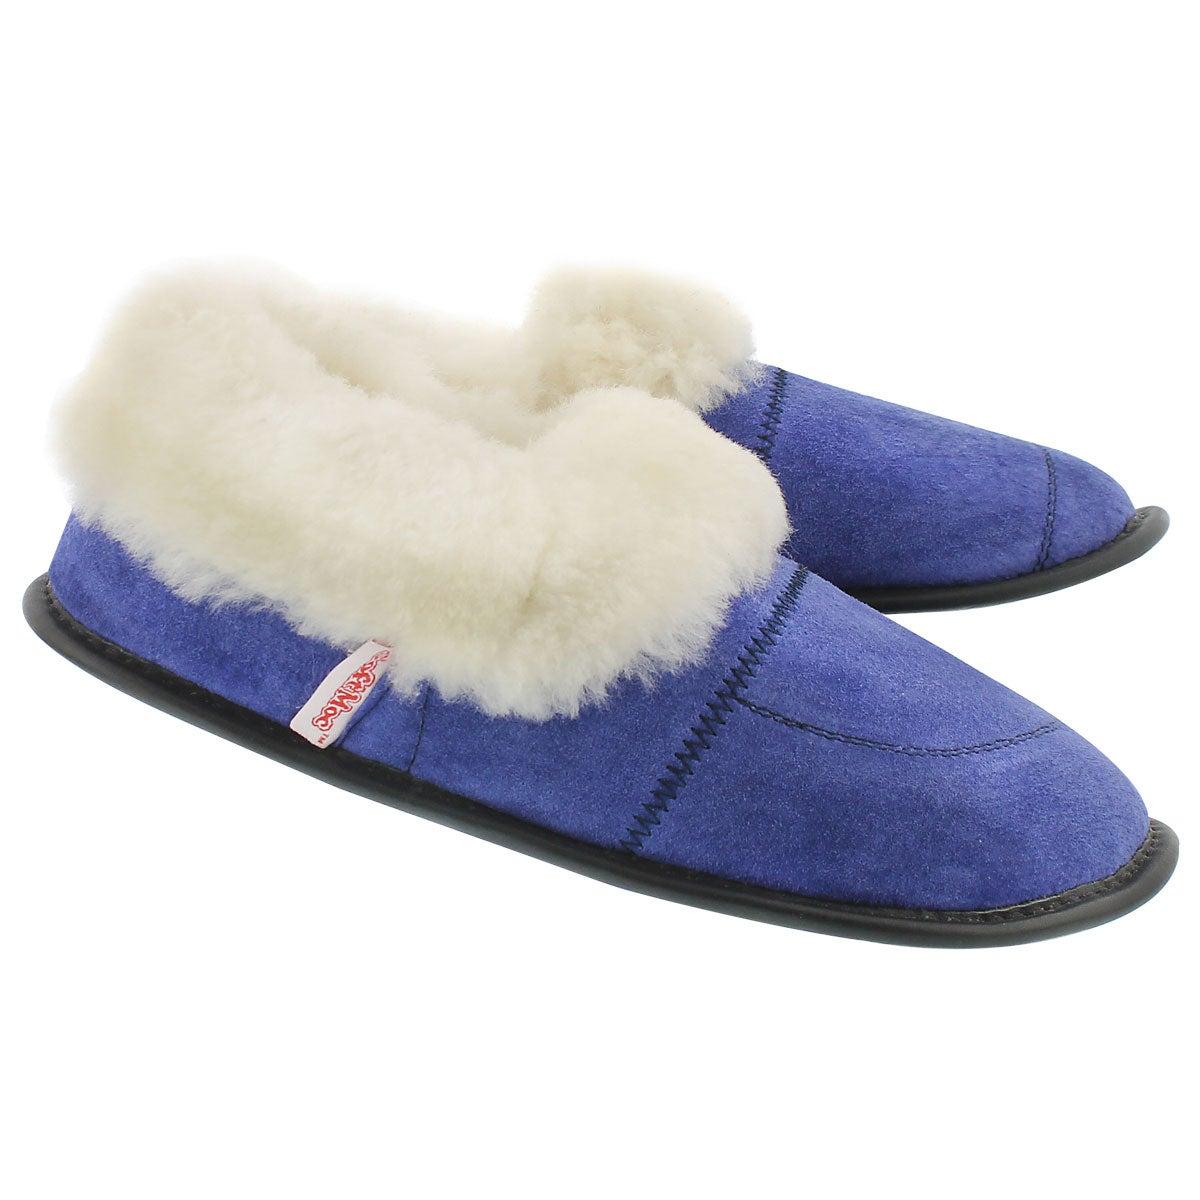 Lds Cuff blue washable sheepskin